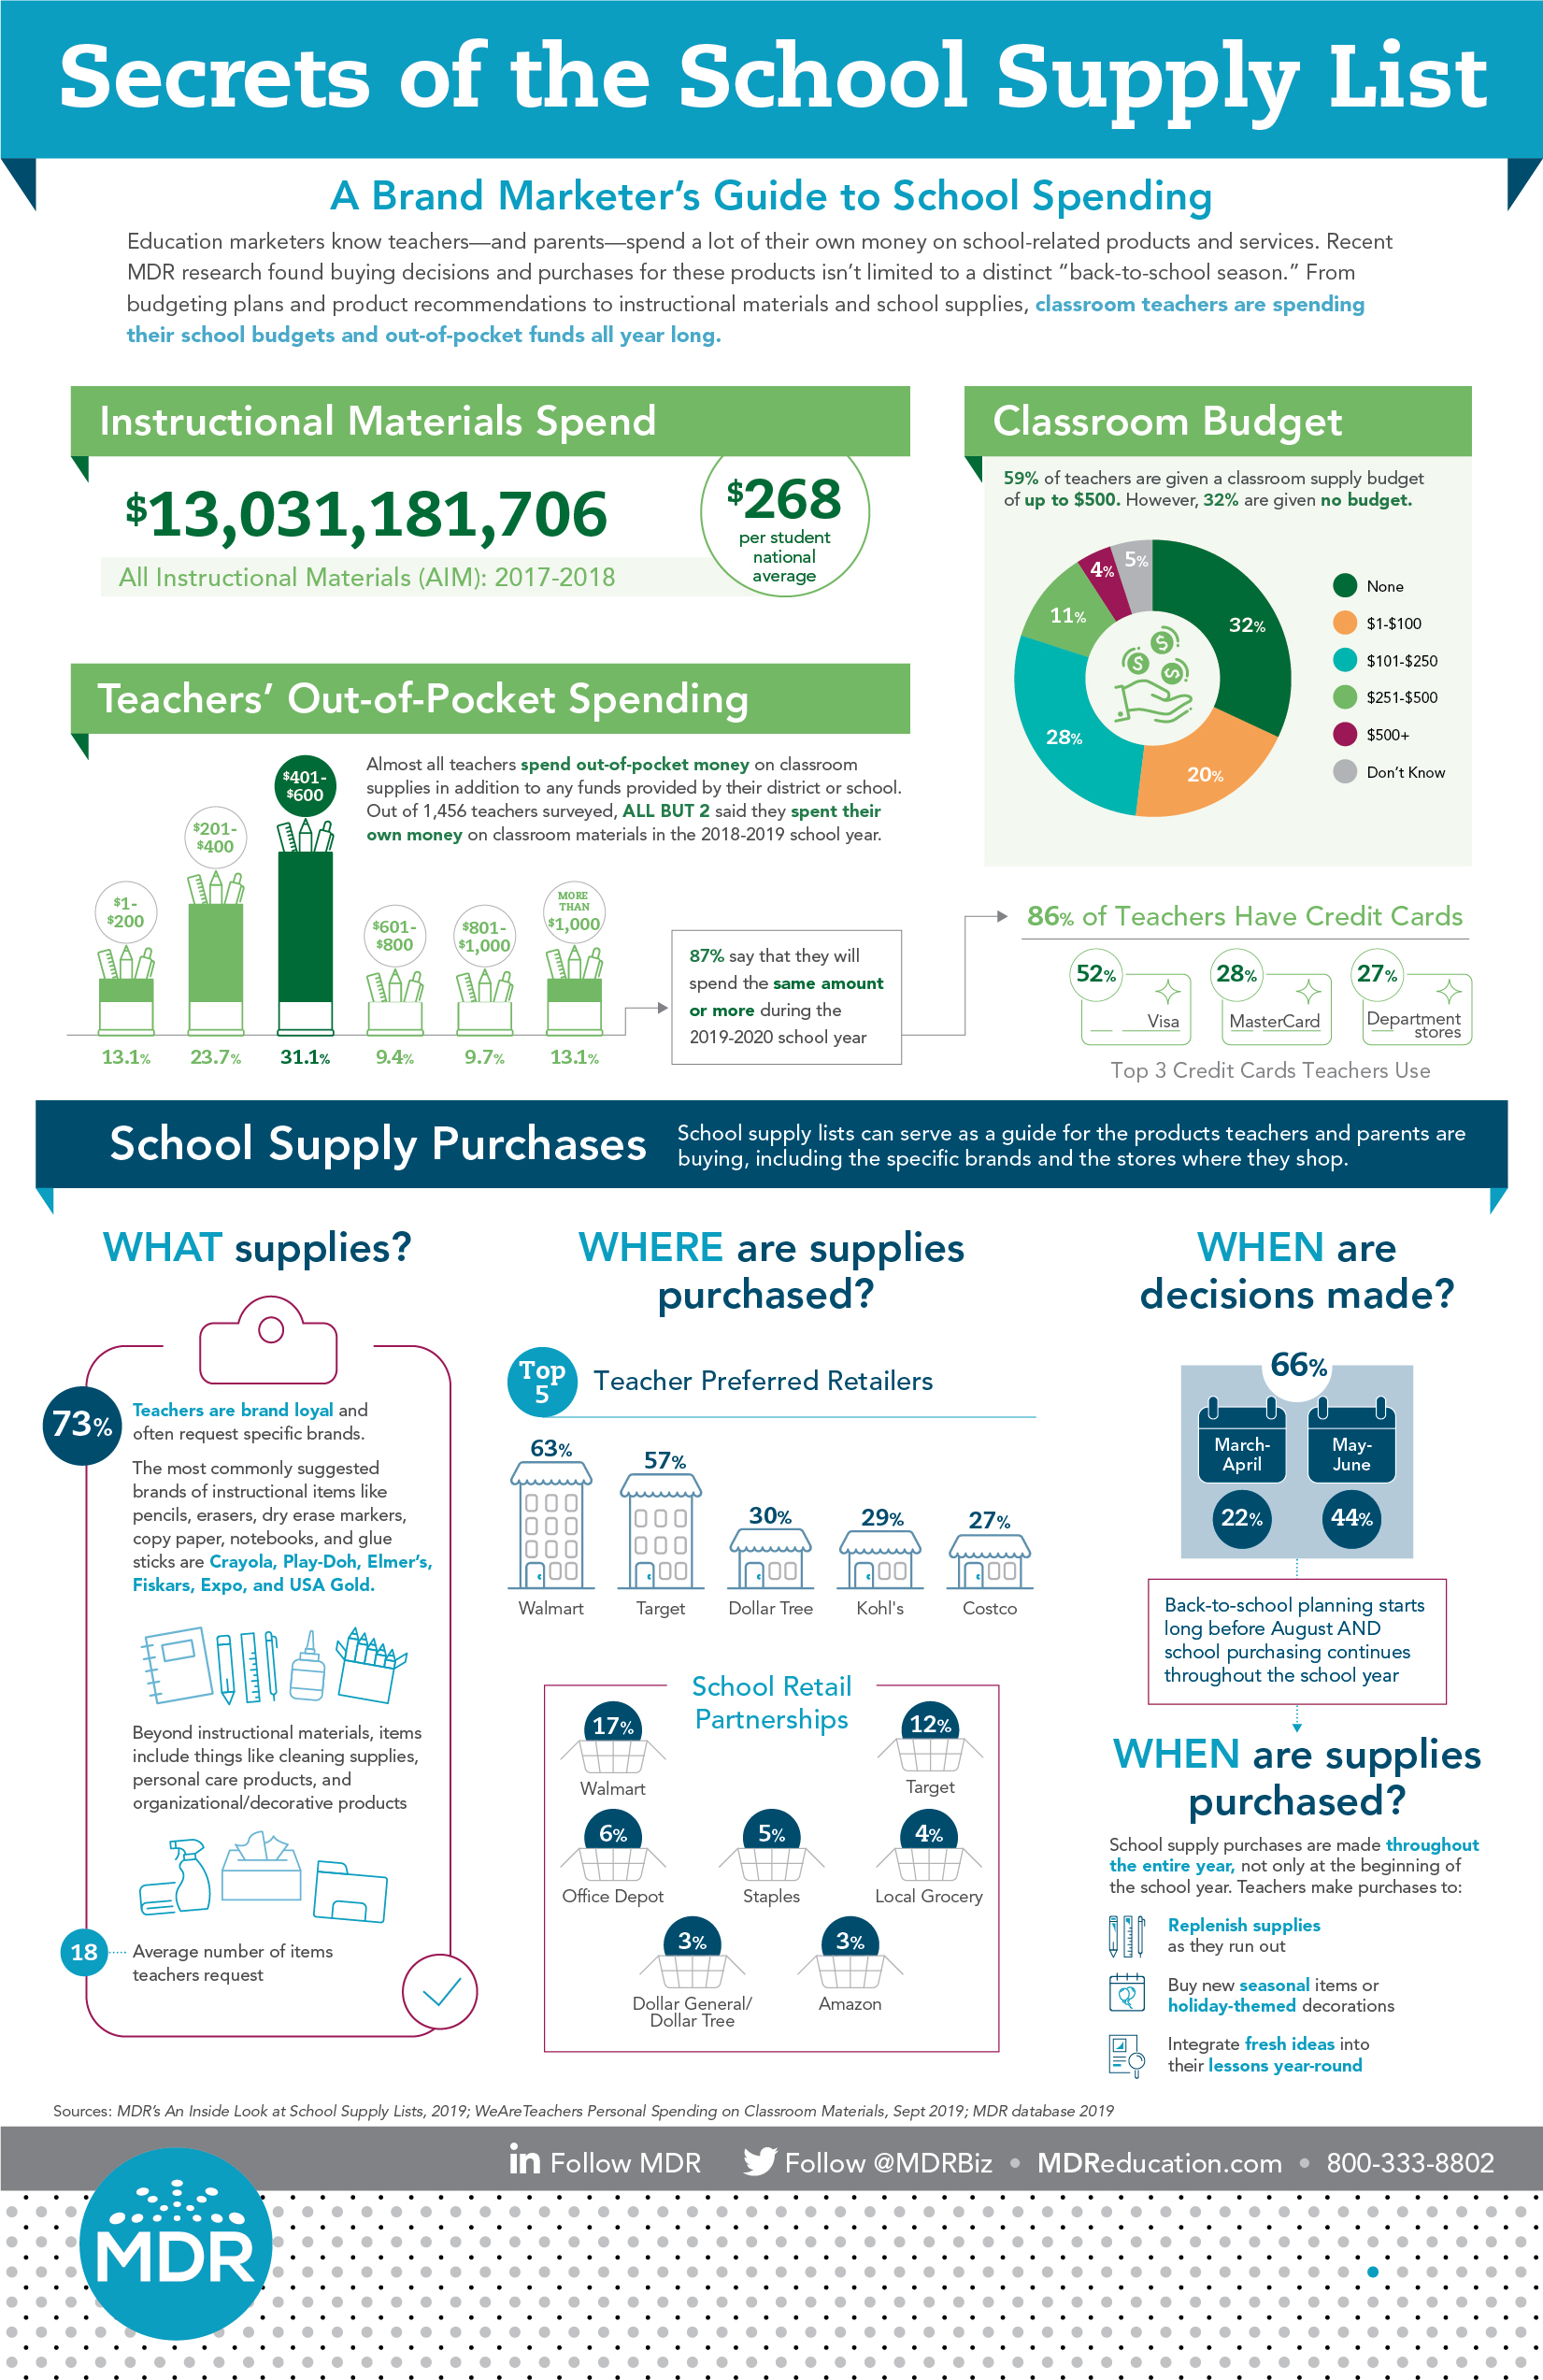 Secrets of the School Supply List infographic